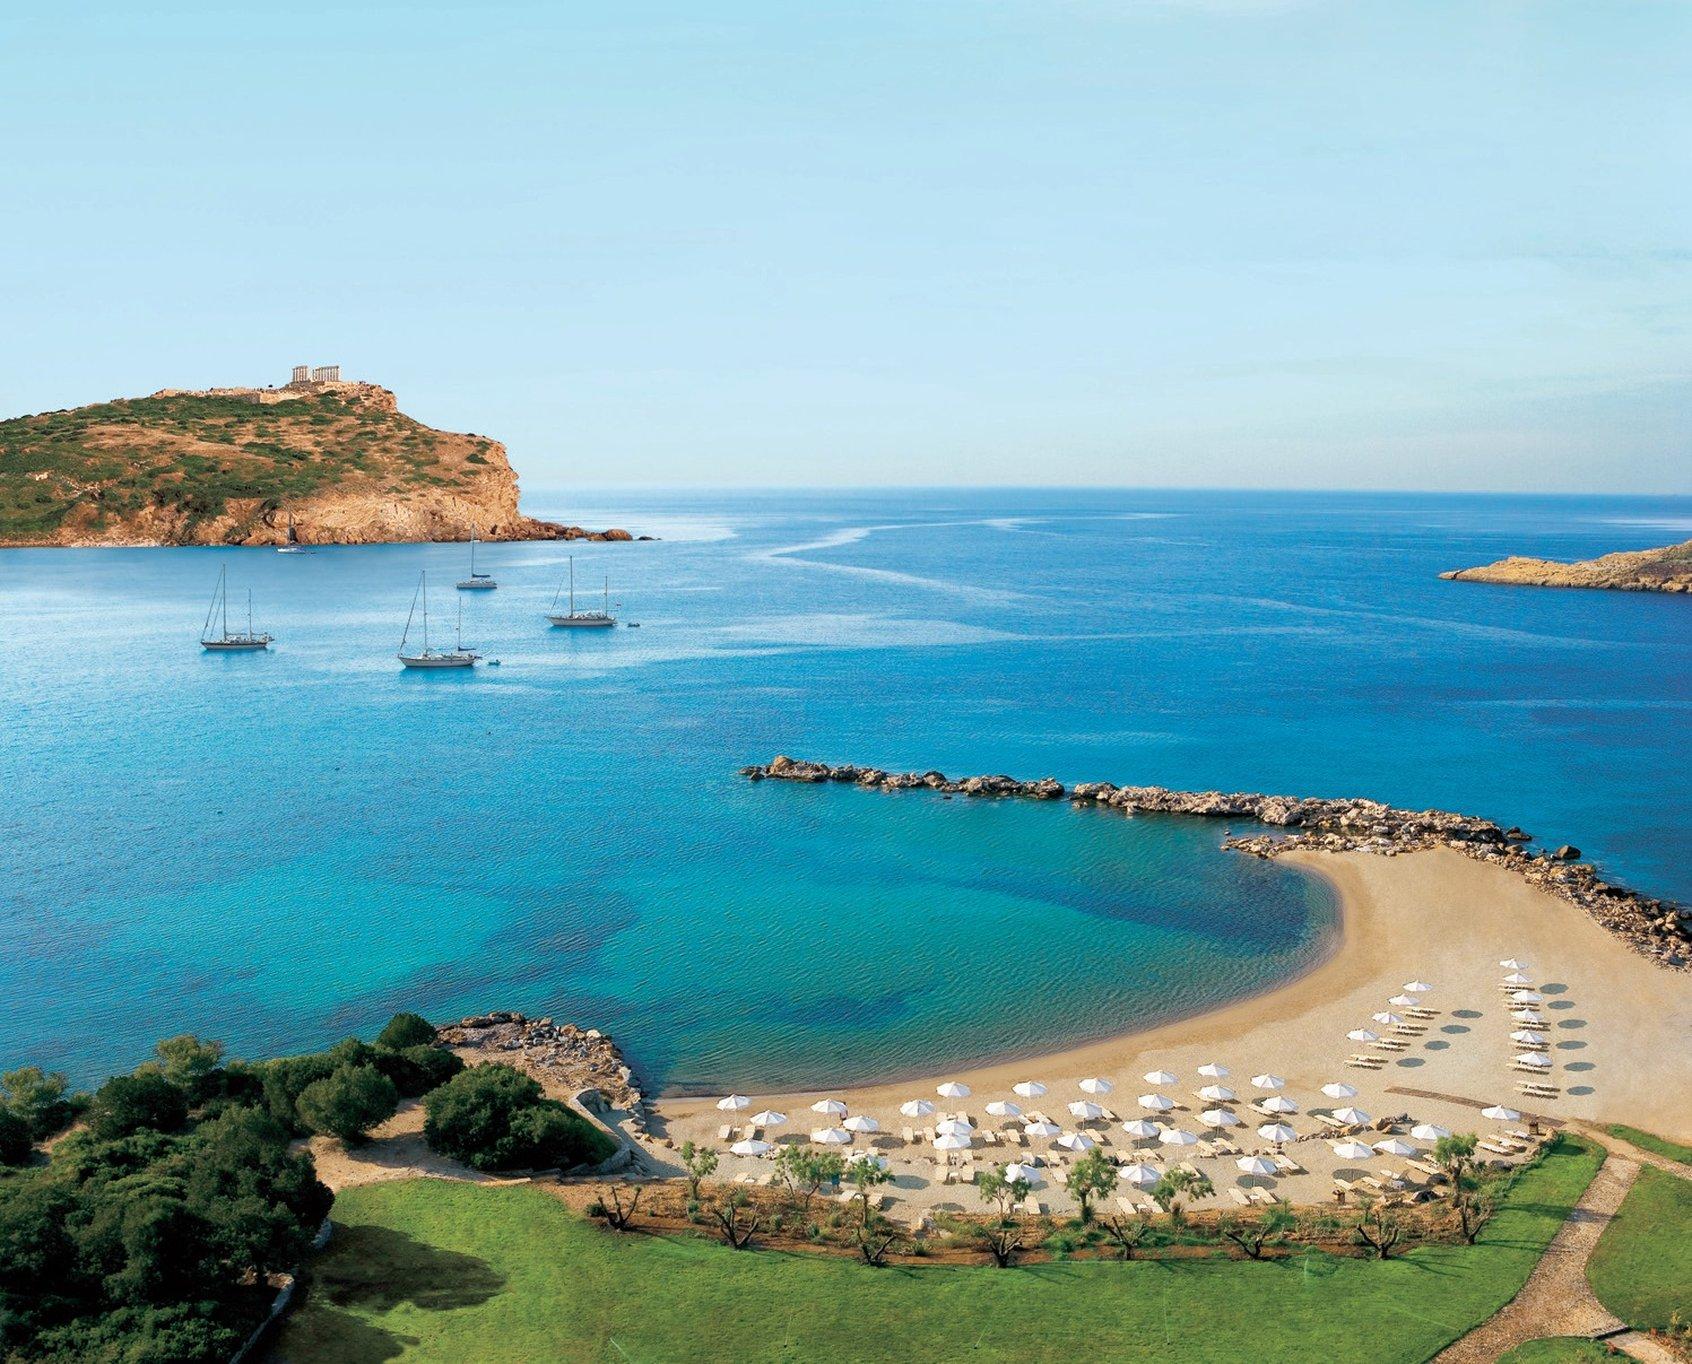 Cape Sounio Exclusive Resort